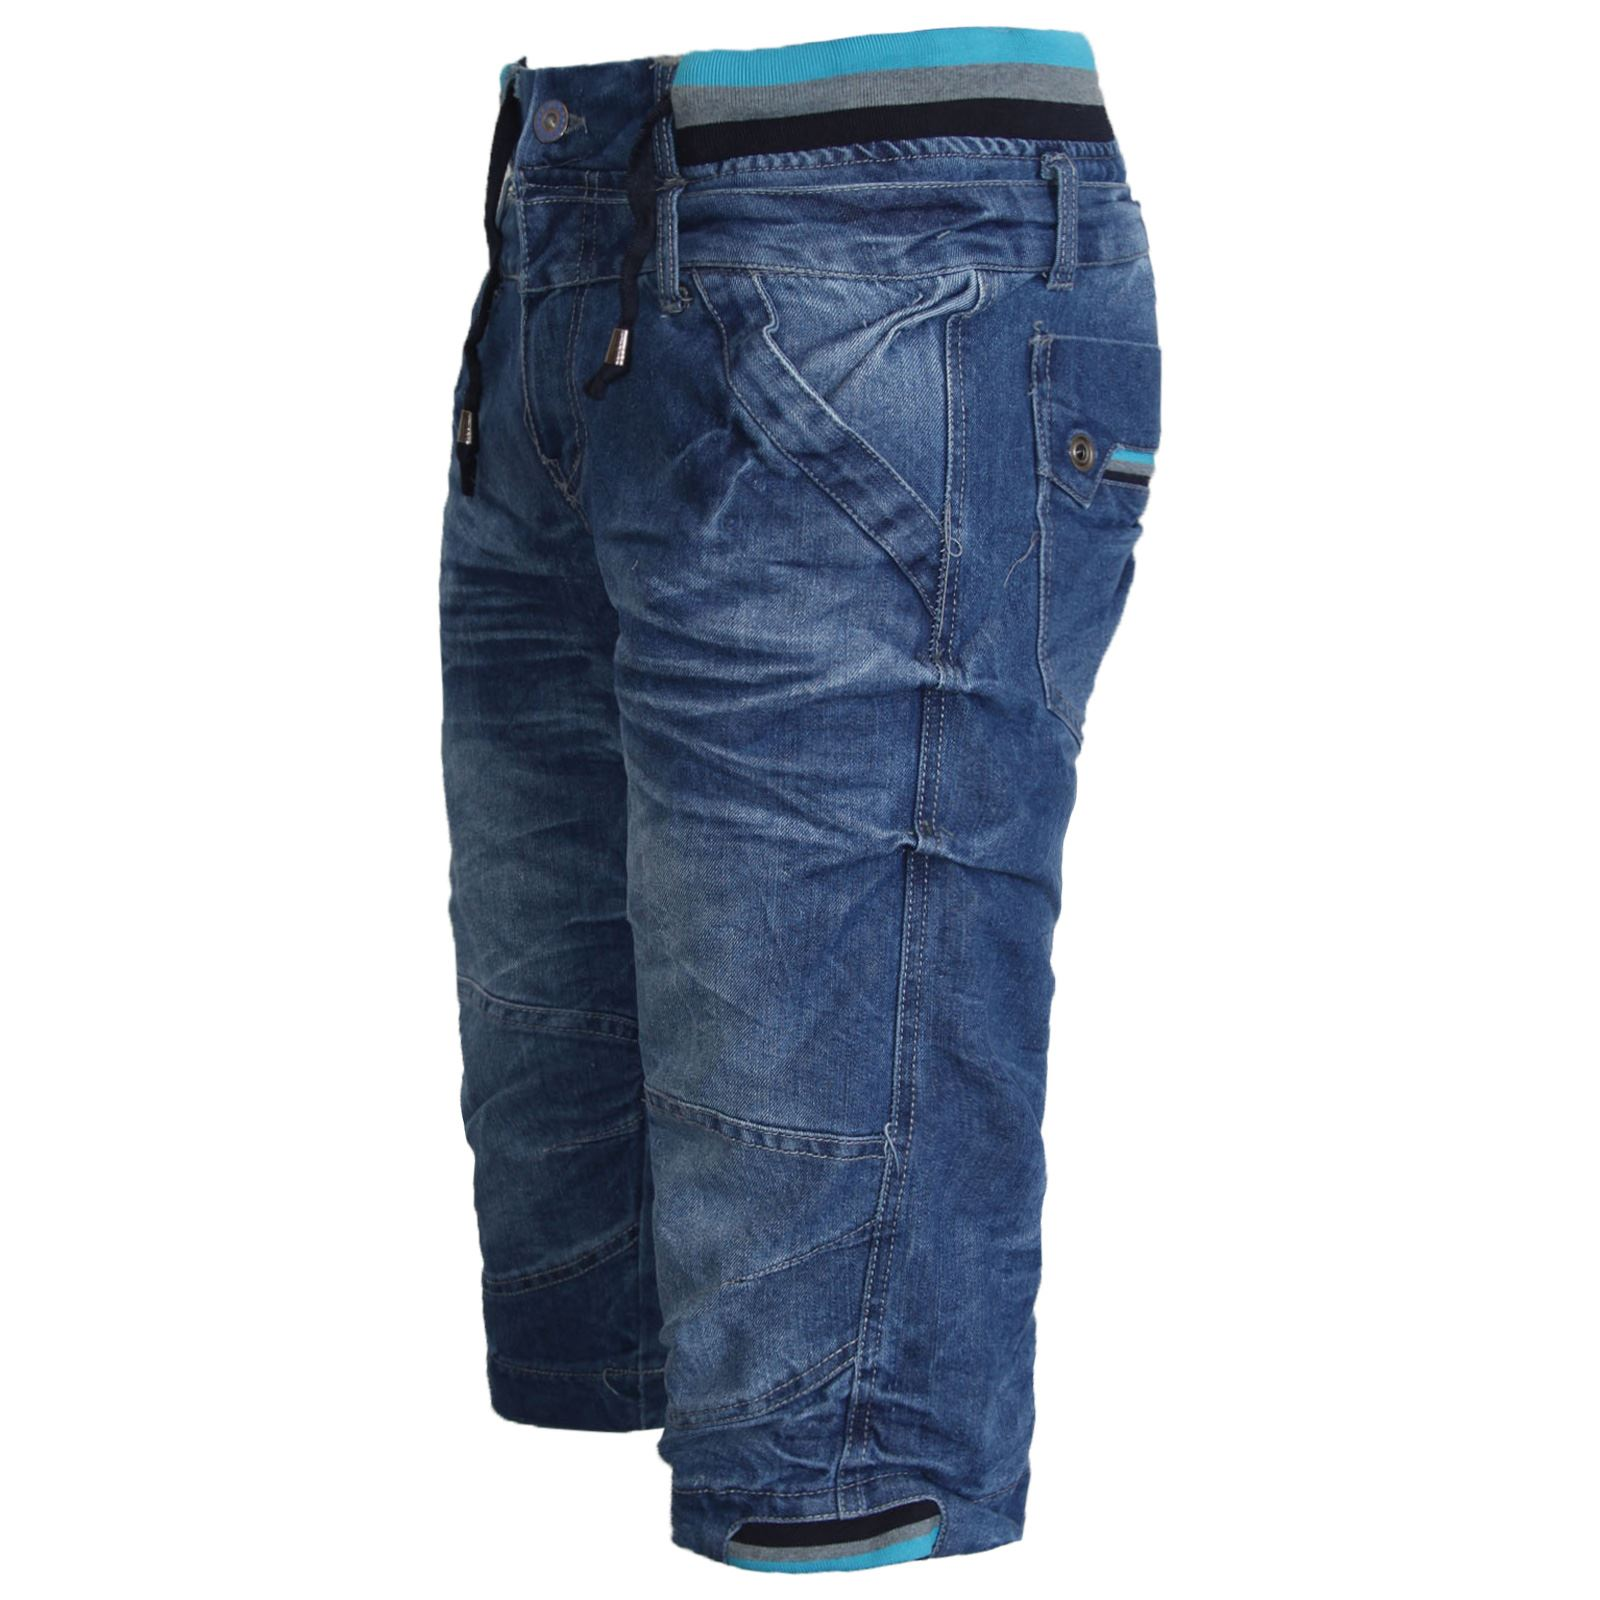 NEW MENS CASUAL DENIM CARGO COMBAT 3/4 LONG SHORTS JEANS PANTS ...